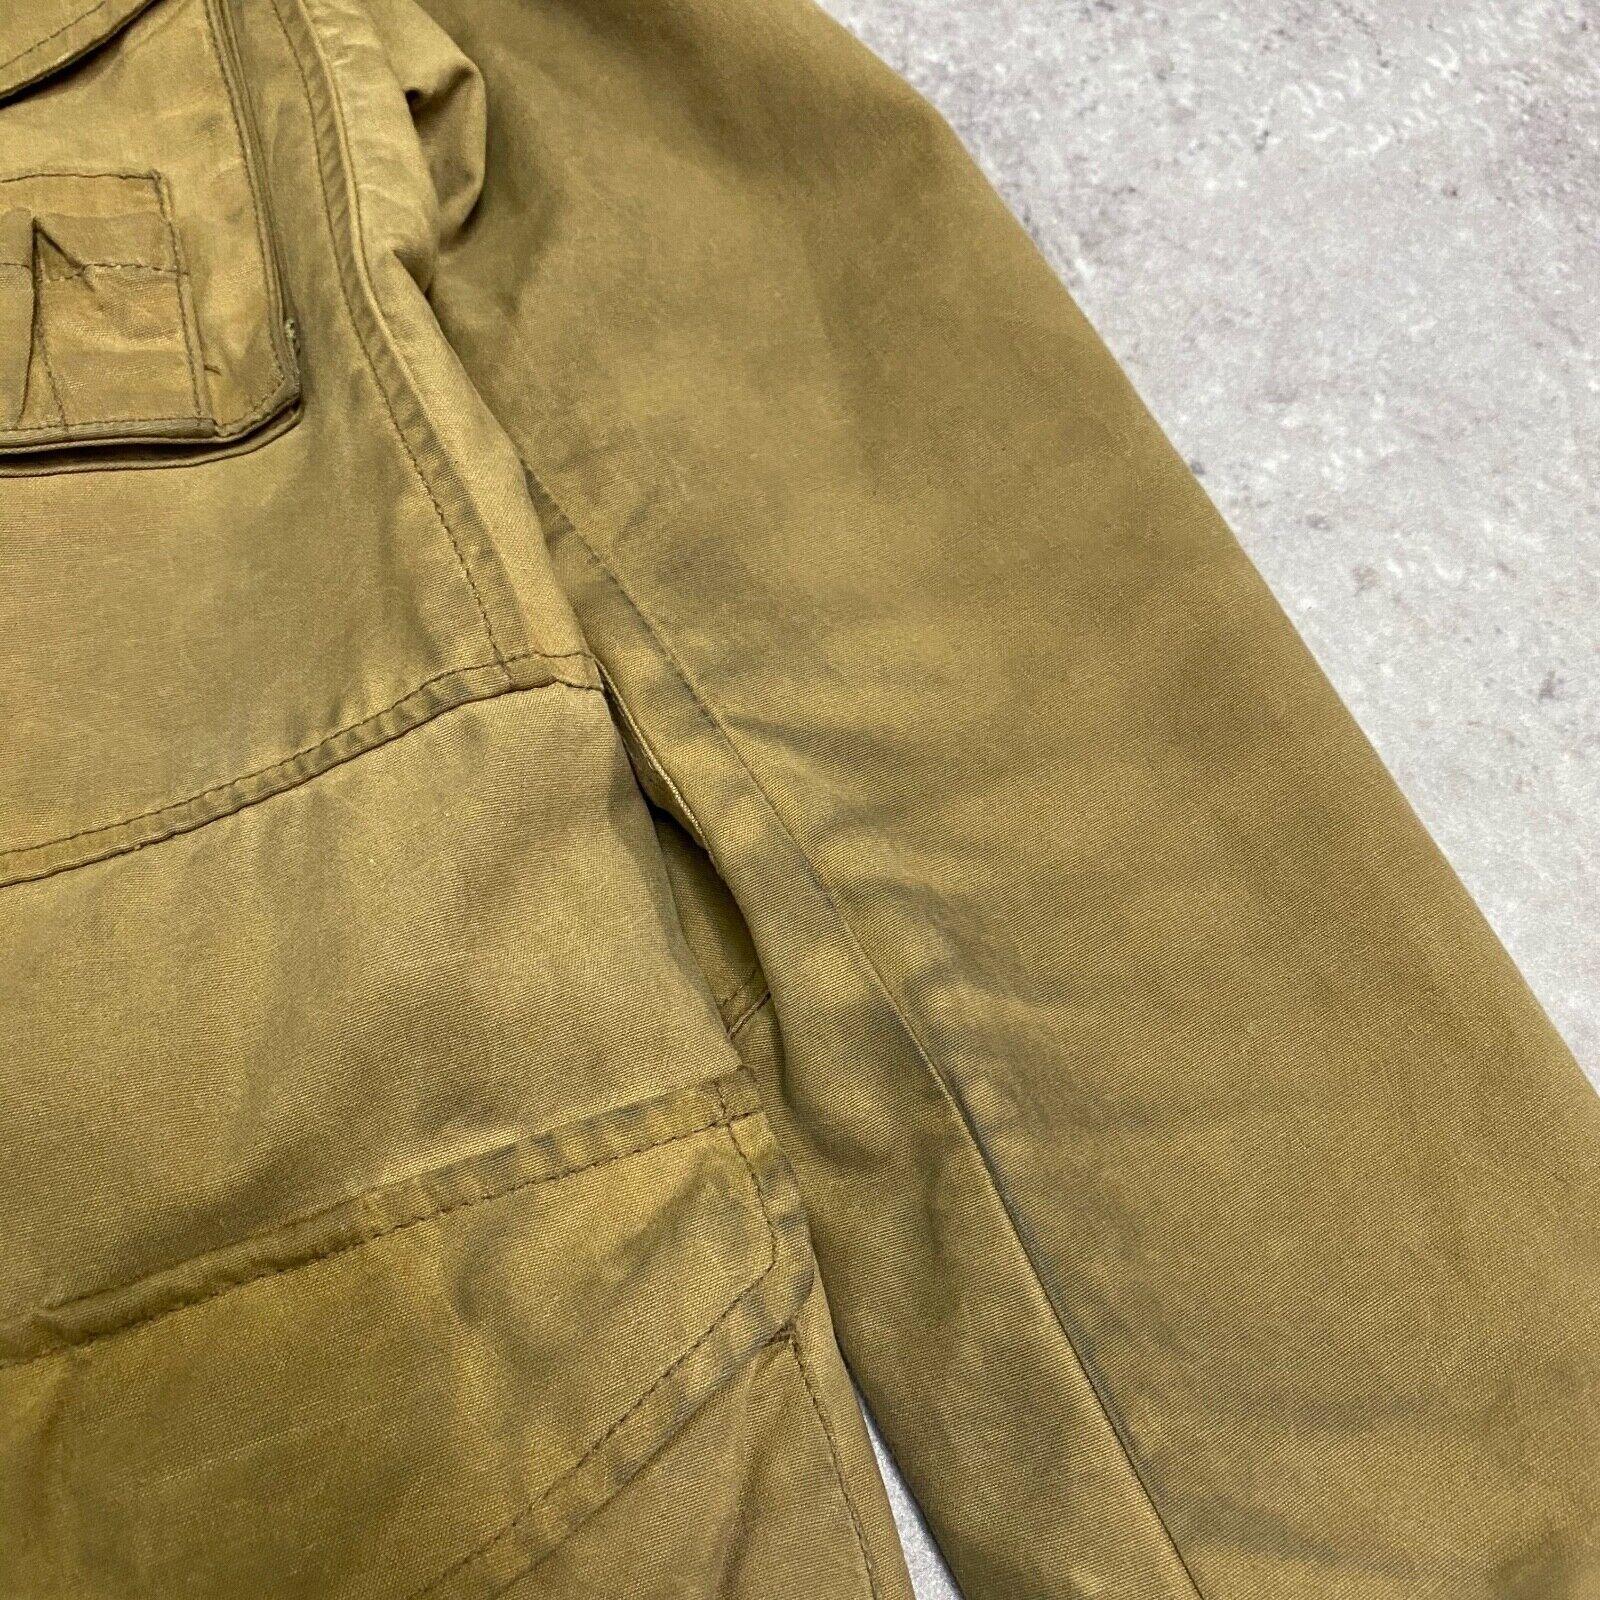 J.Crew Field Jacket Size XS Brown Wax Distressed - image 10